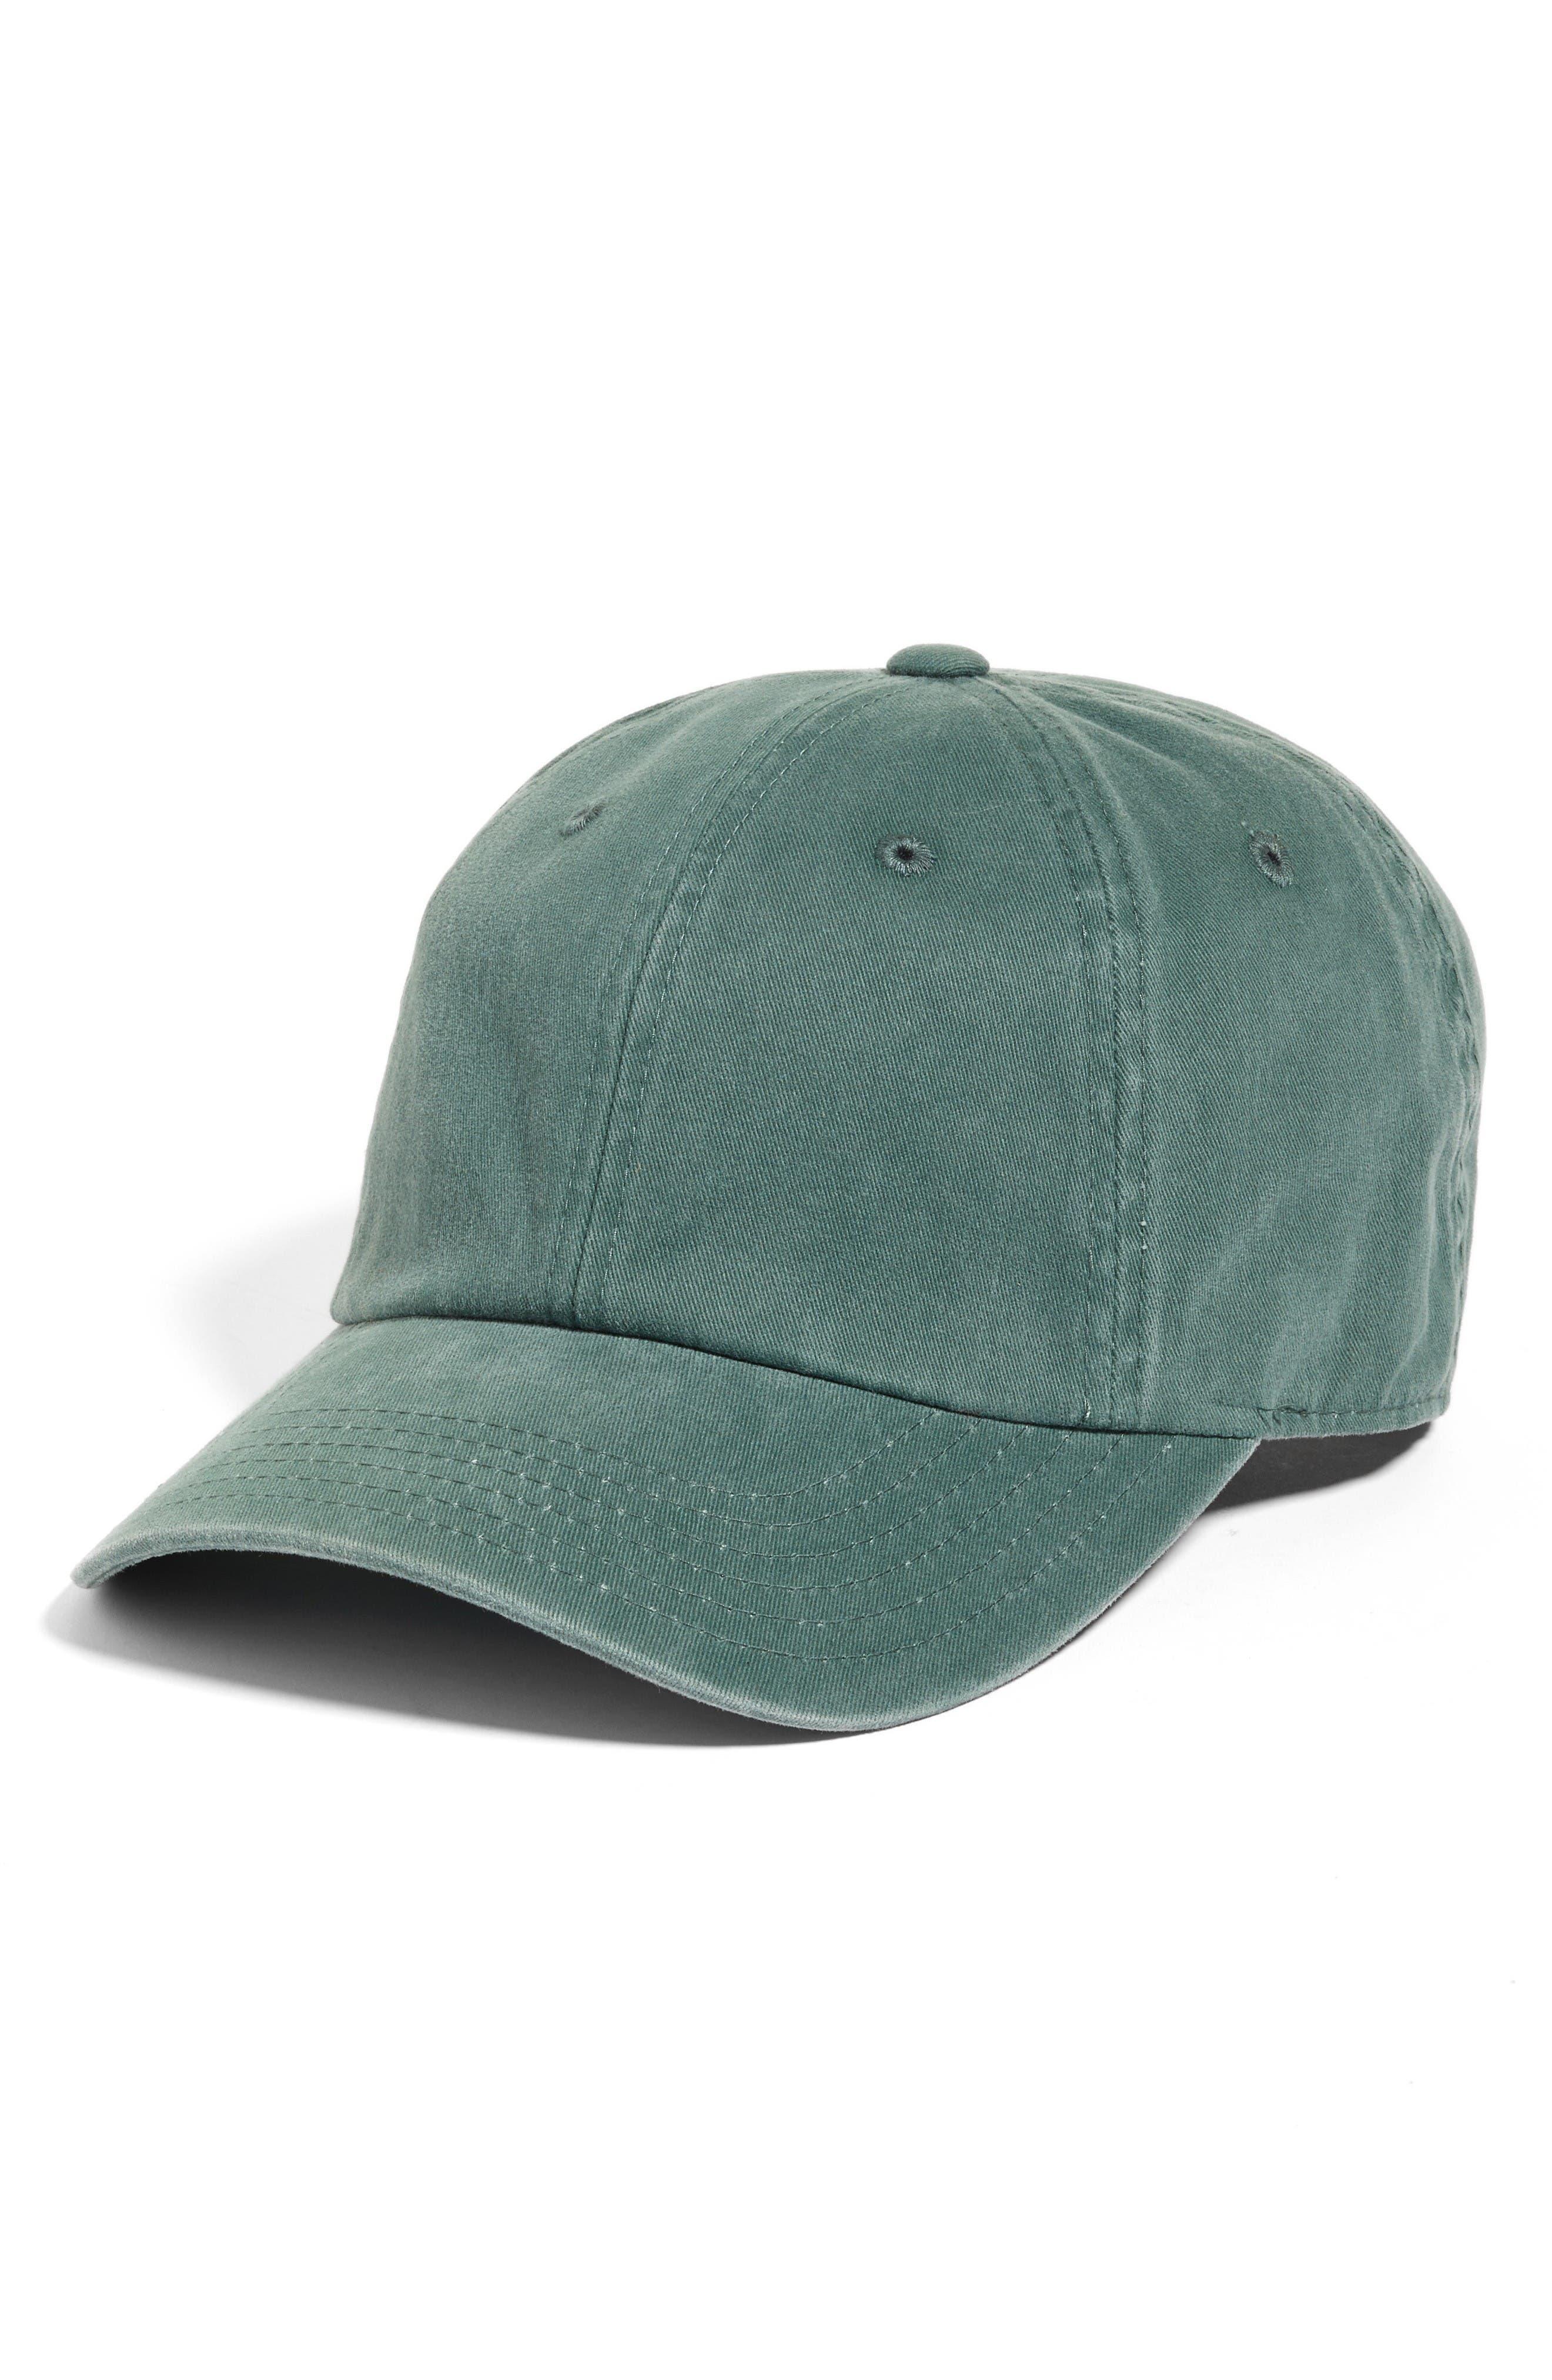 American Needle Washed Baseball Cap